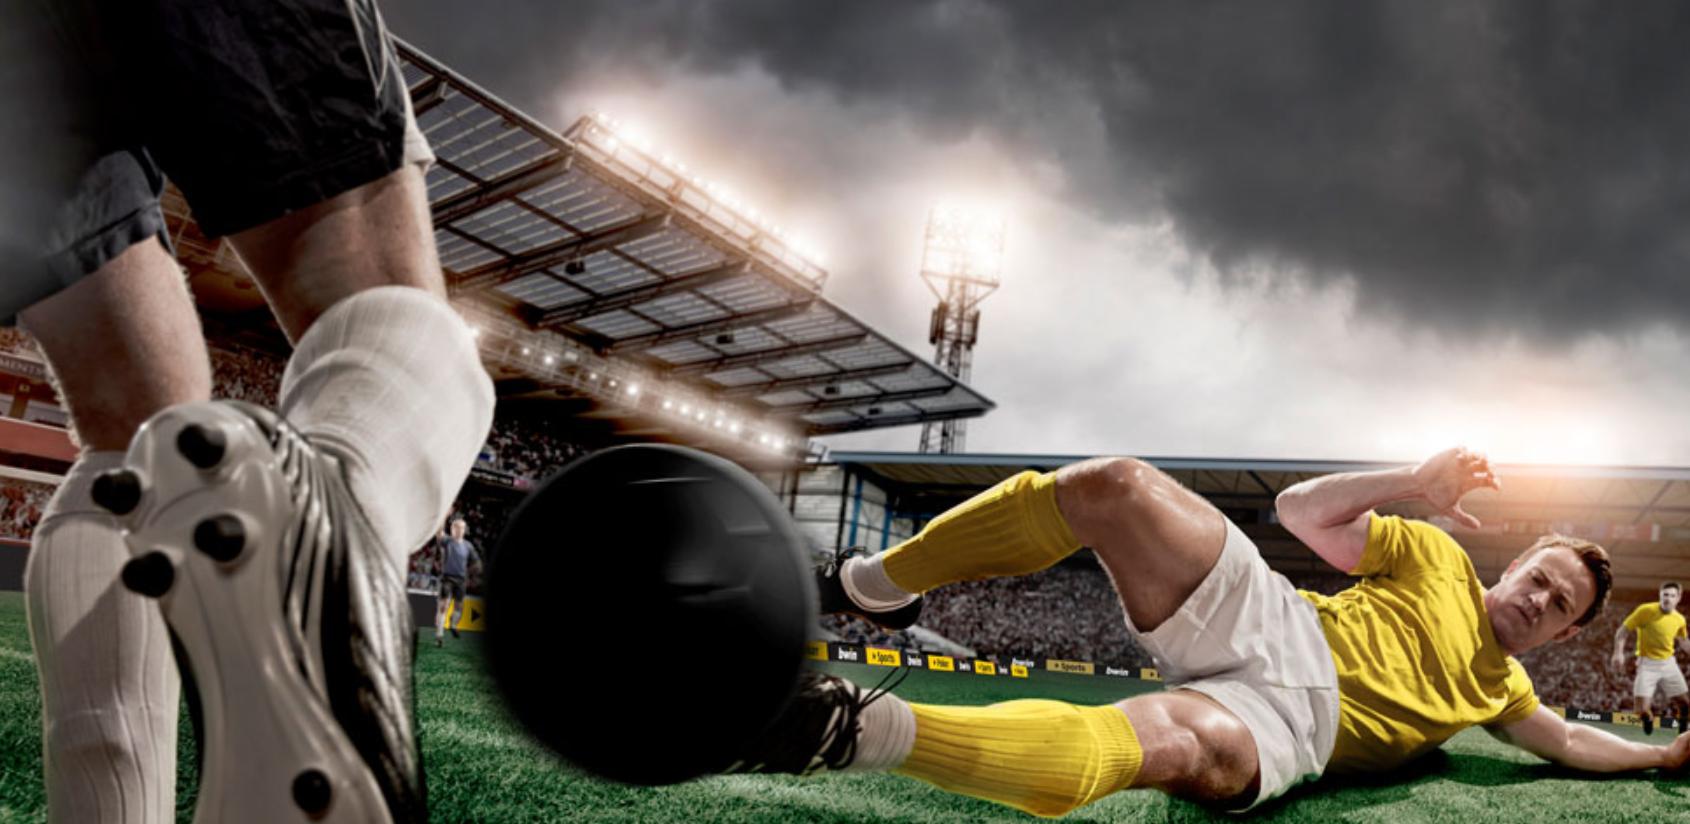 1XBET COM – การพนันฟุตบอล